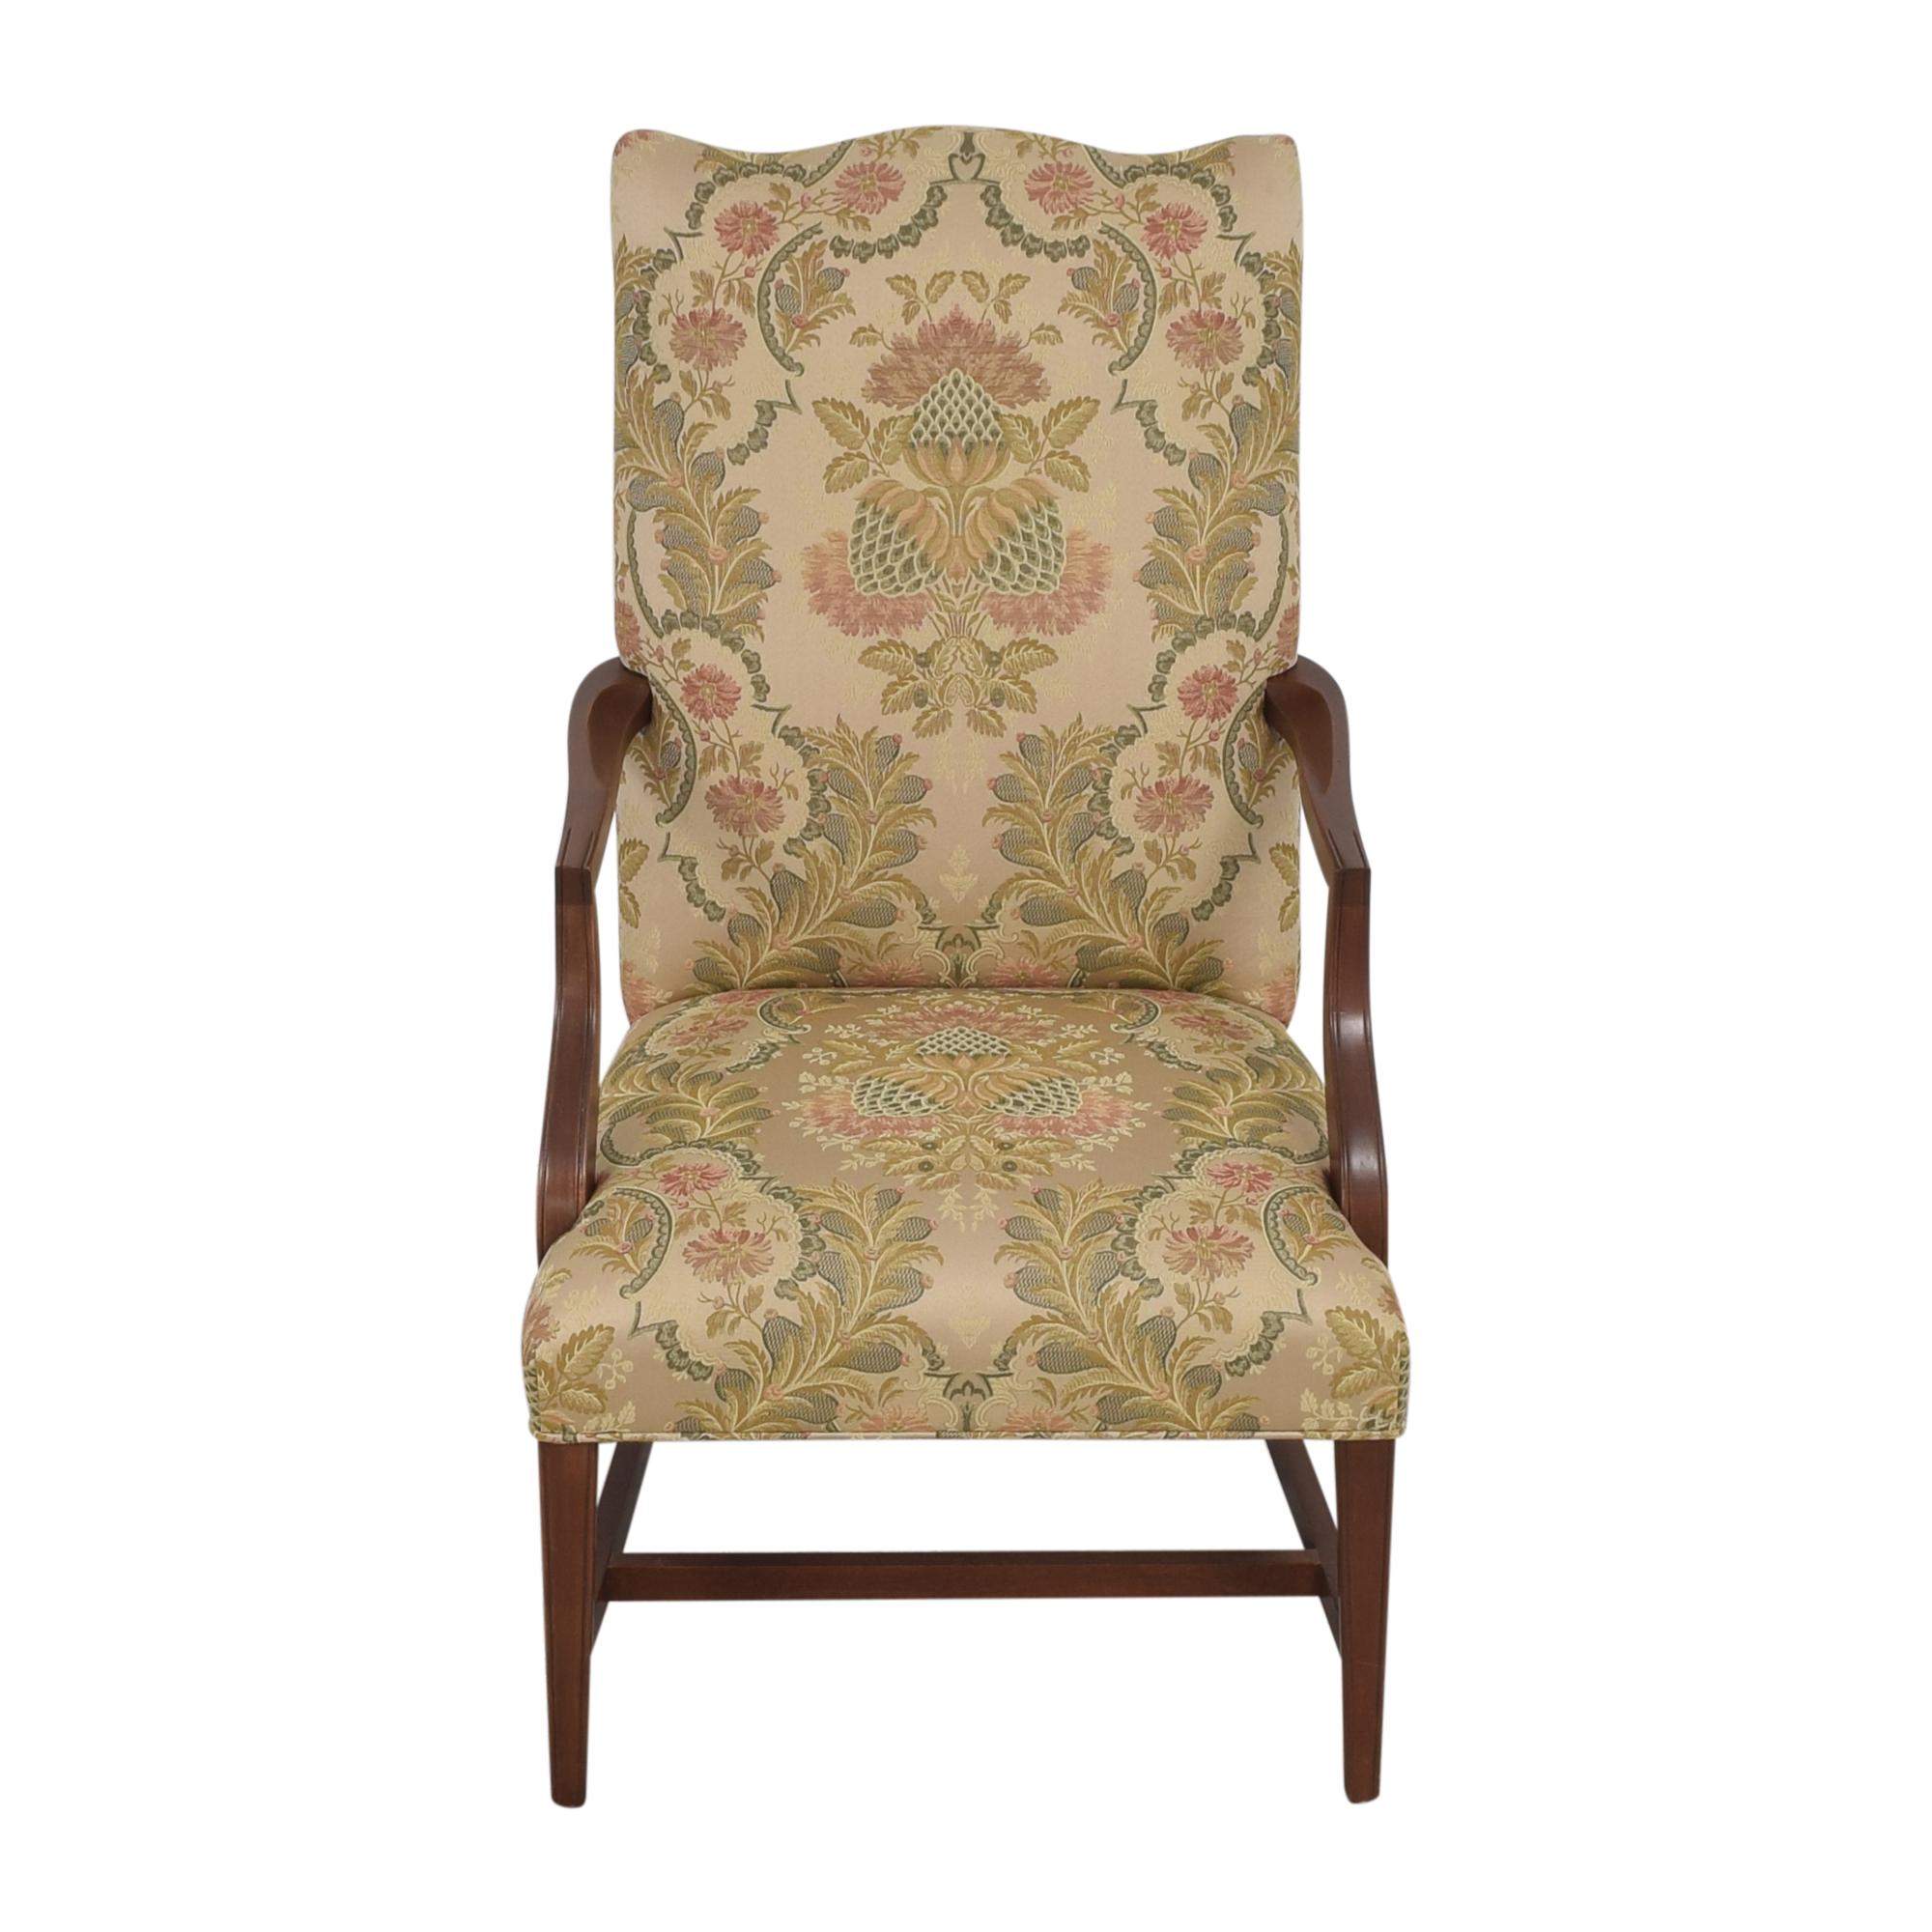 Ethan Allen Ethan Allen Martha Washington Arm Chair used